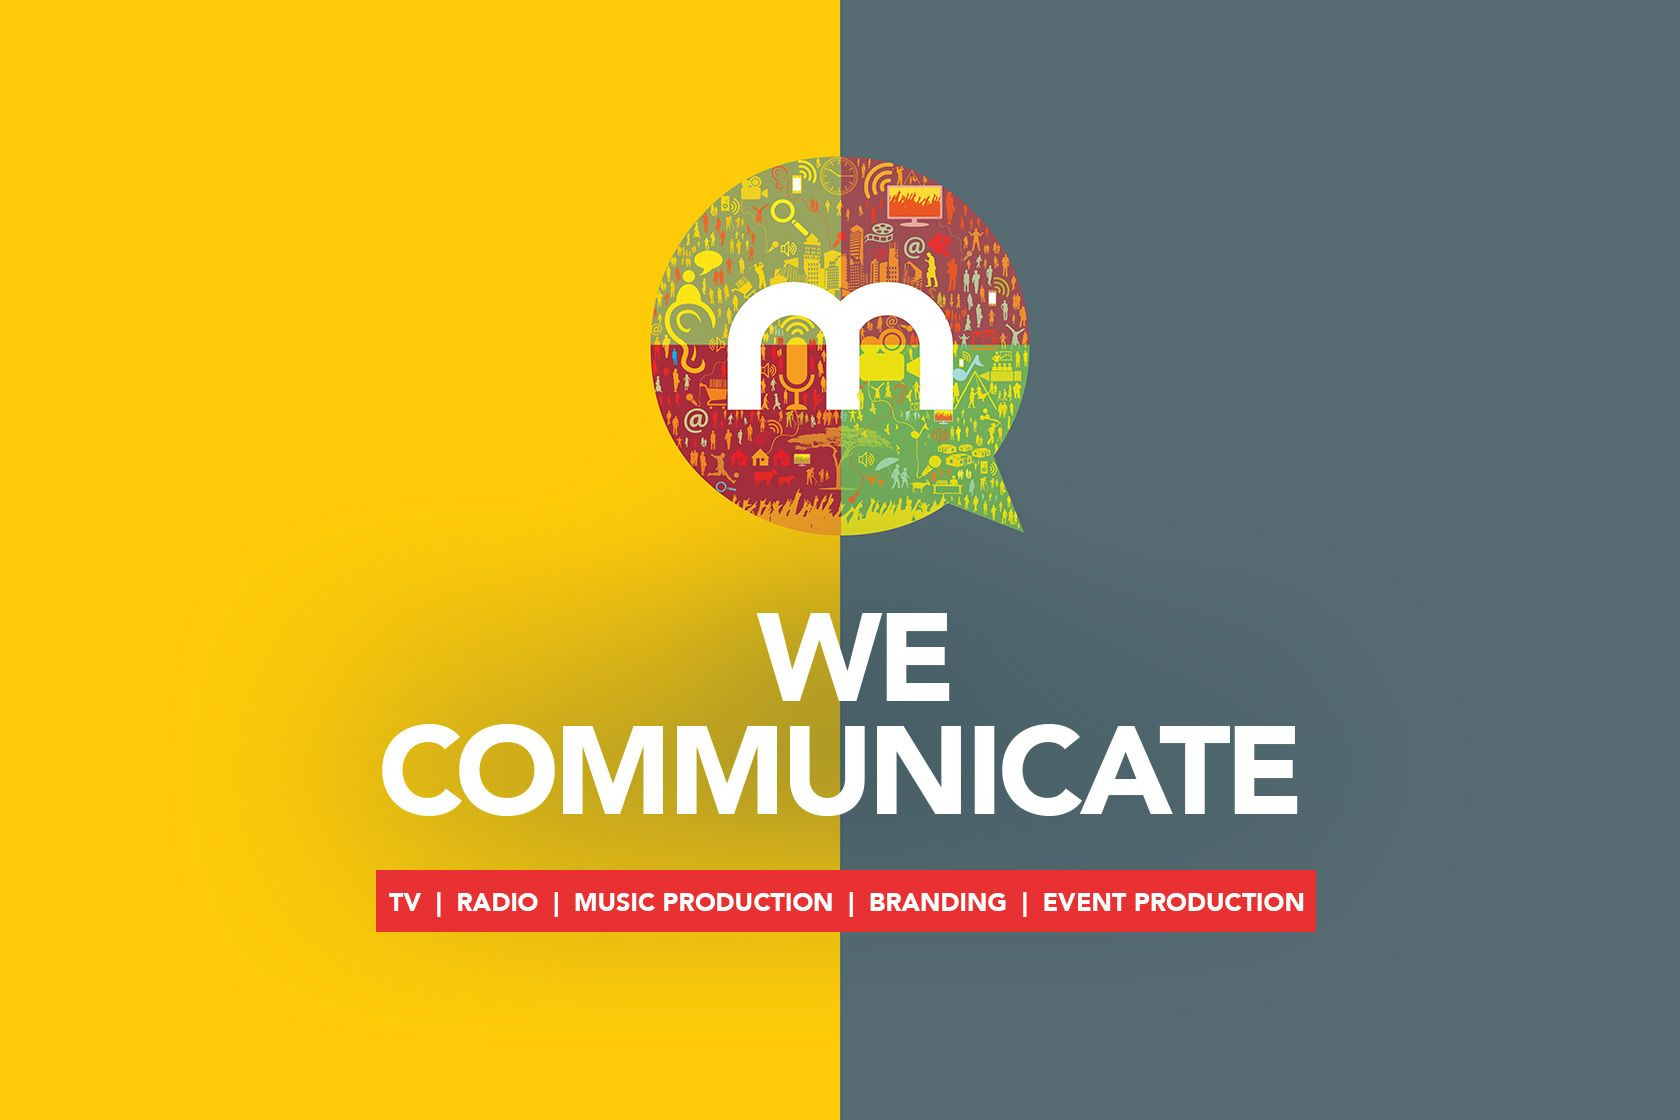 We Communicate!